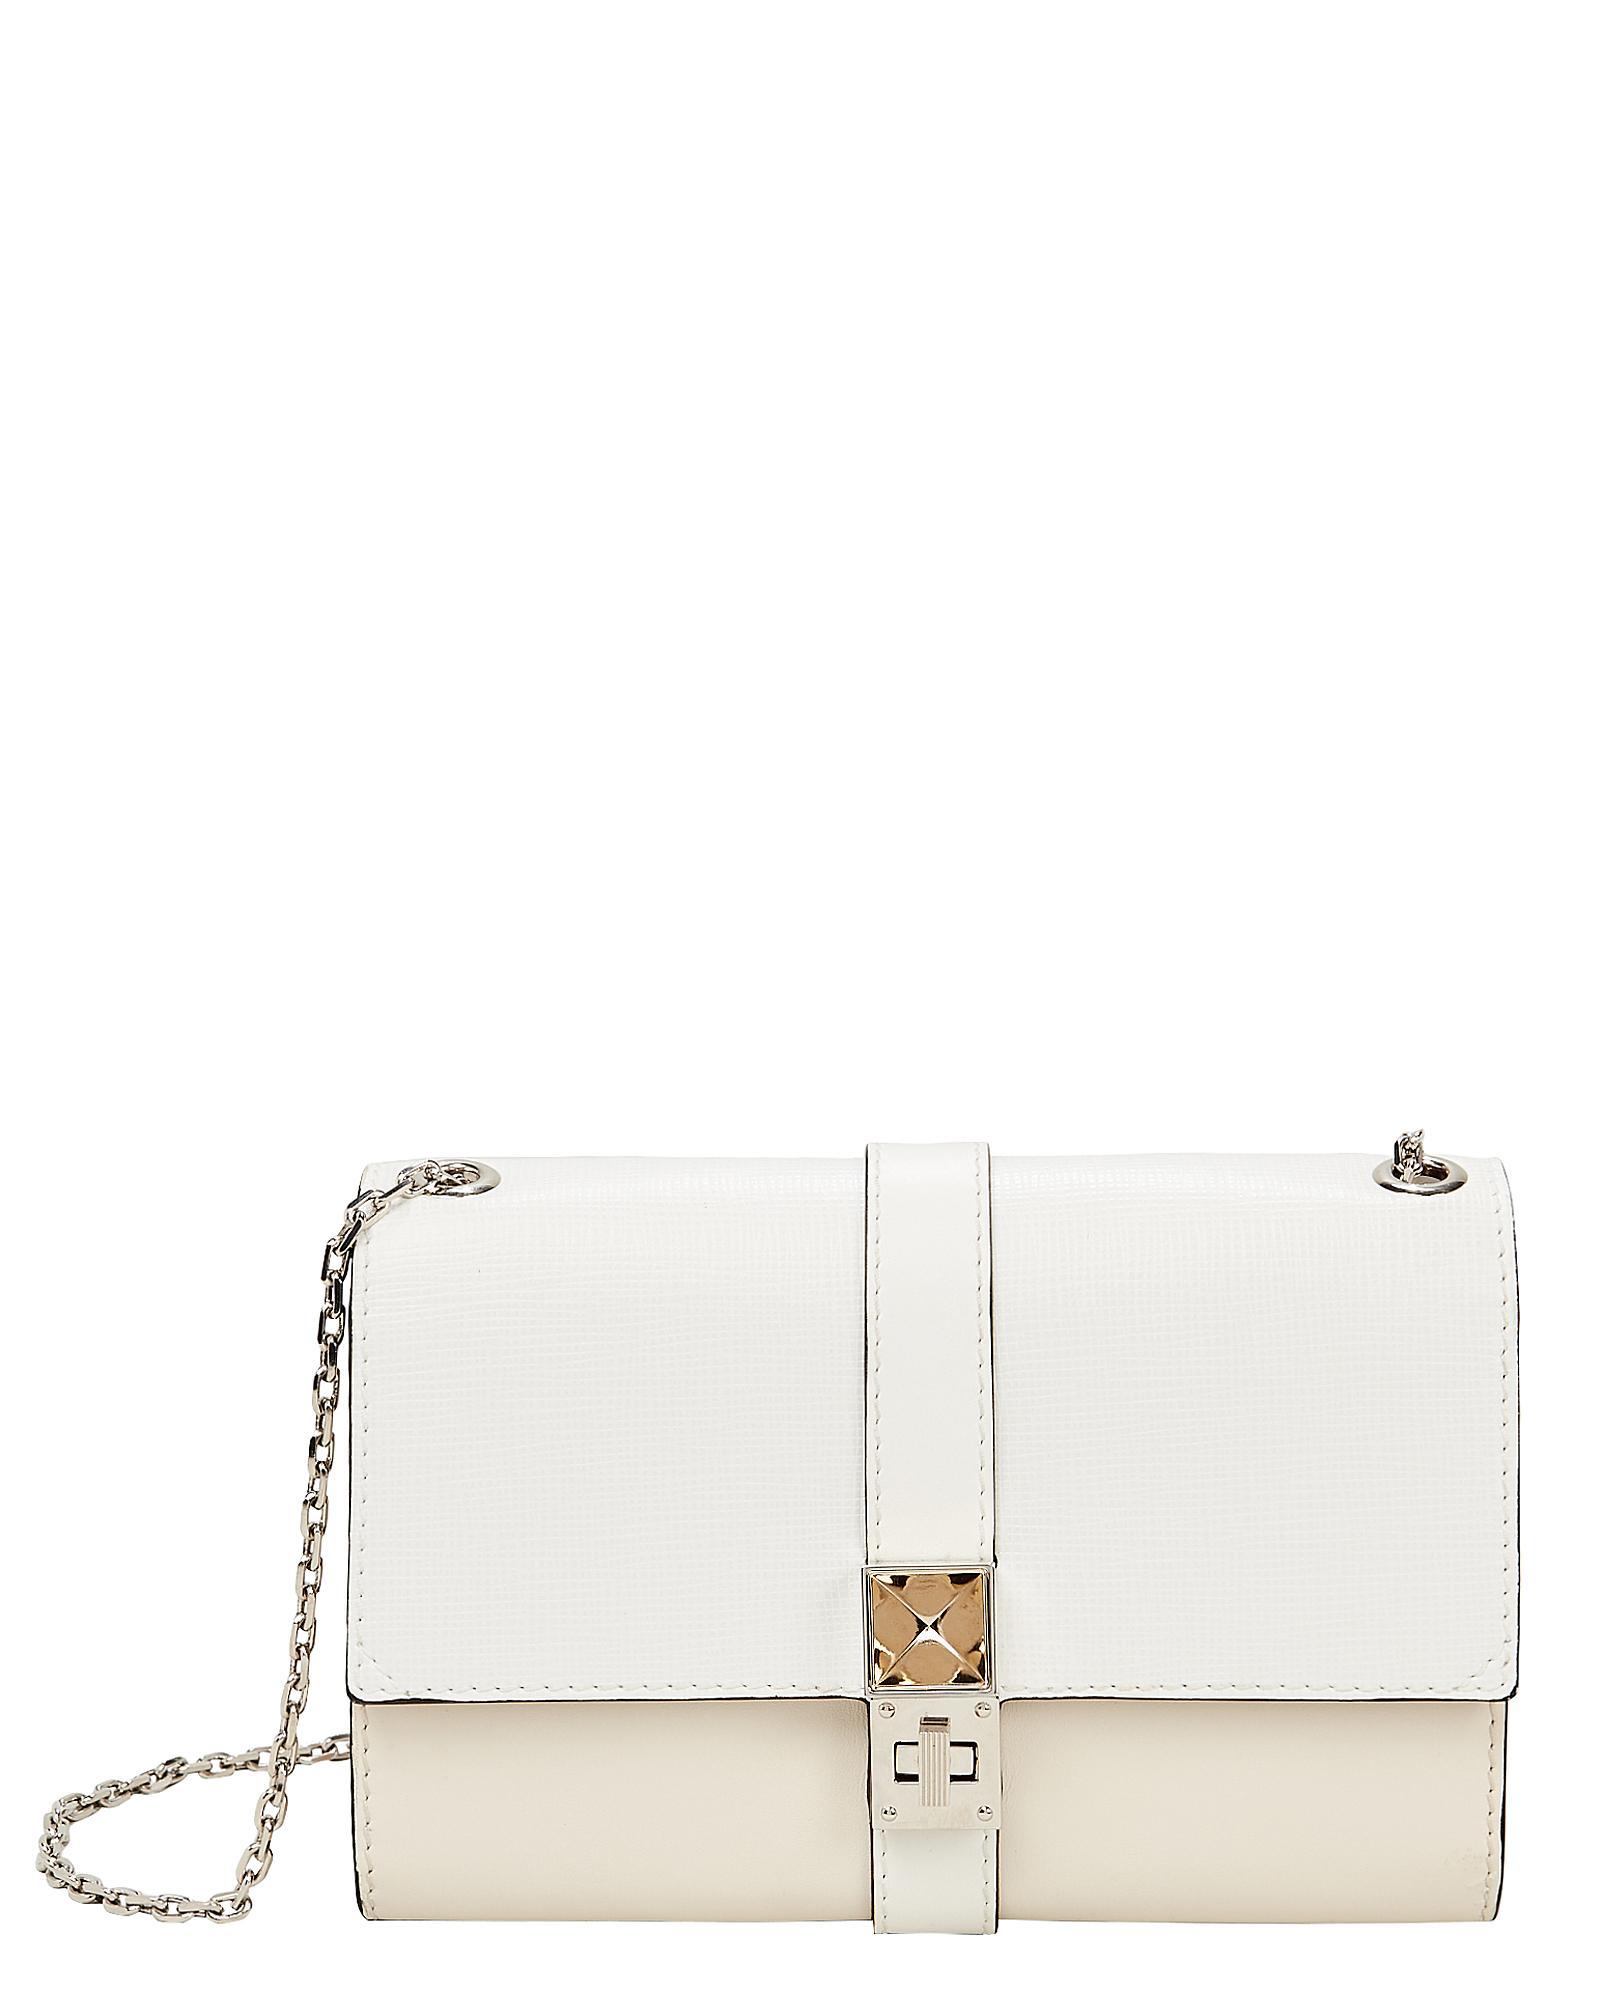 790544c3ef75 Lyst - Proenza Schouler Ps11 Ivory Chain Clutch Bag in White